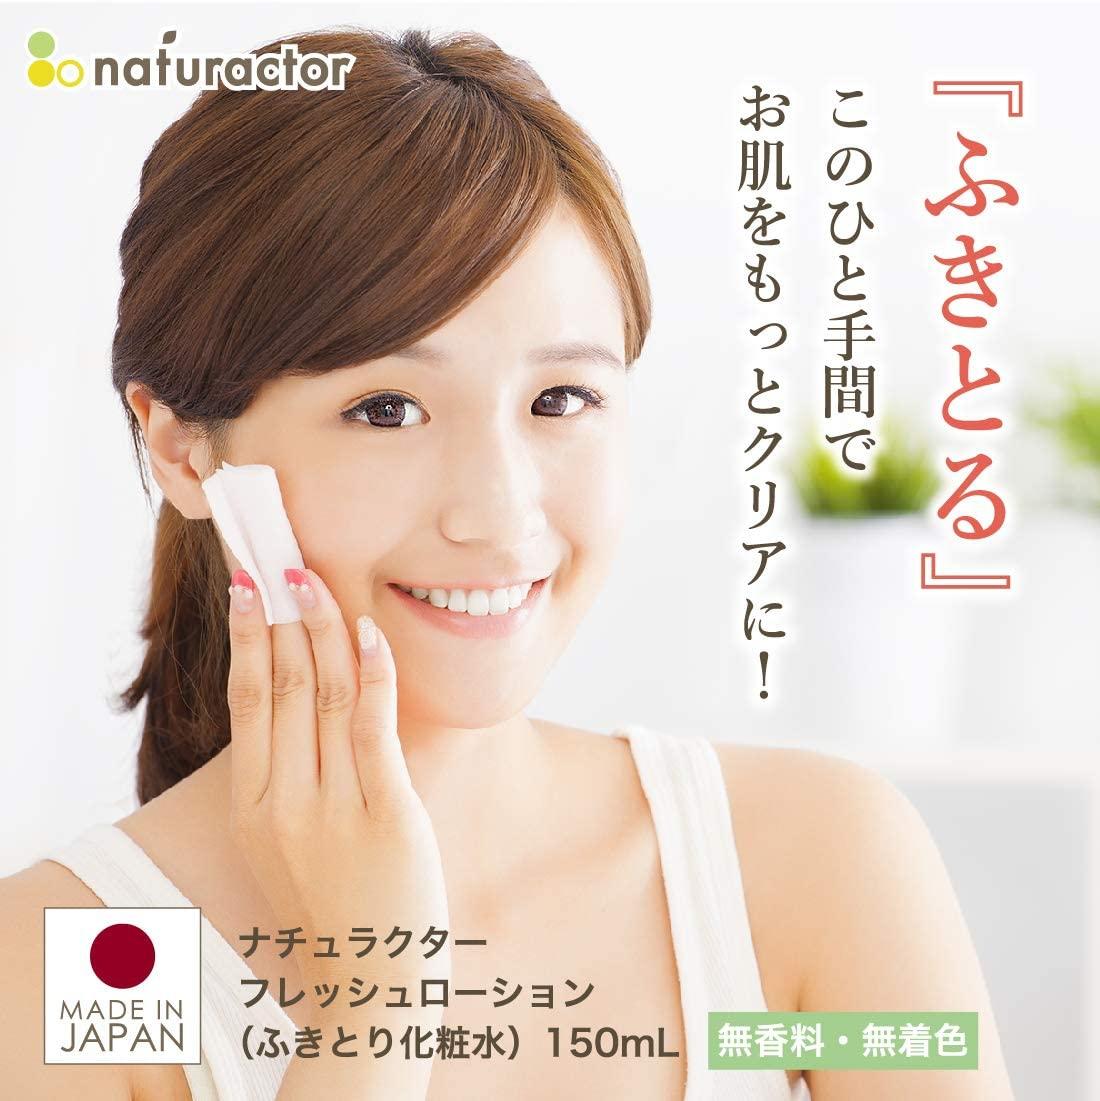 naturactor(ナチュラクター)フレッシュローション(ふきとり化粧水)の商品画像2